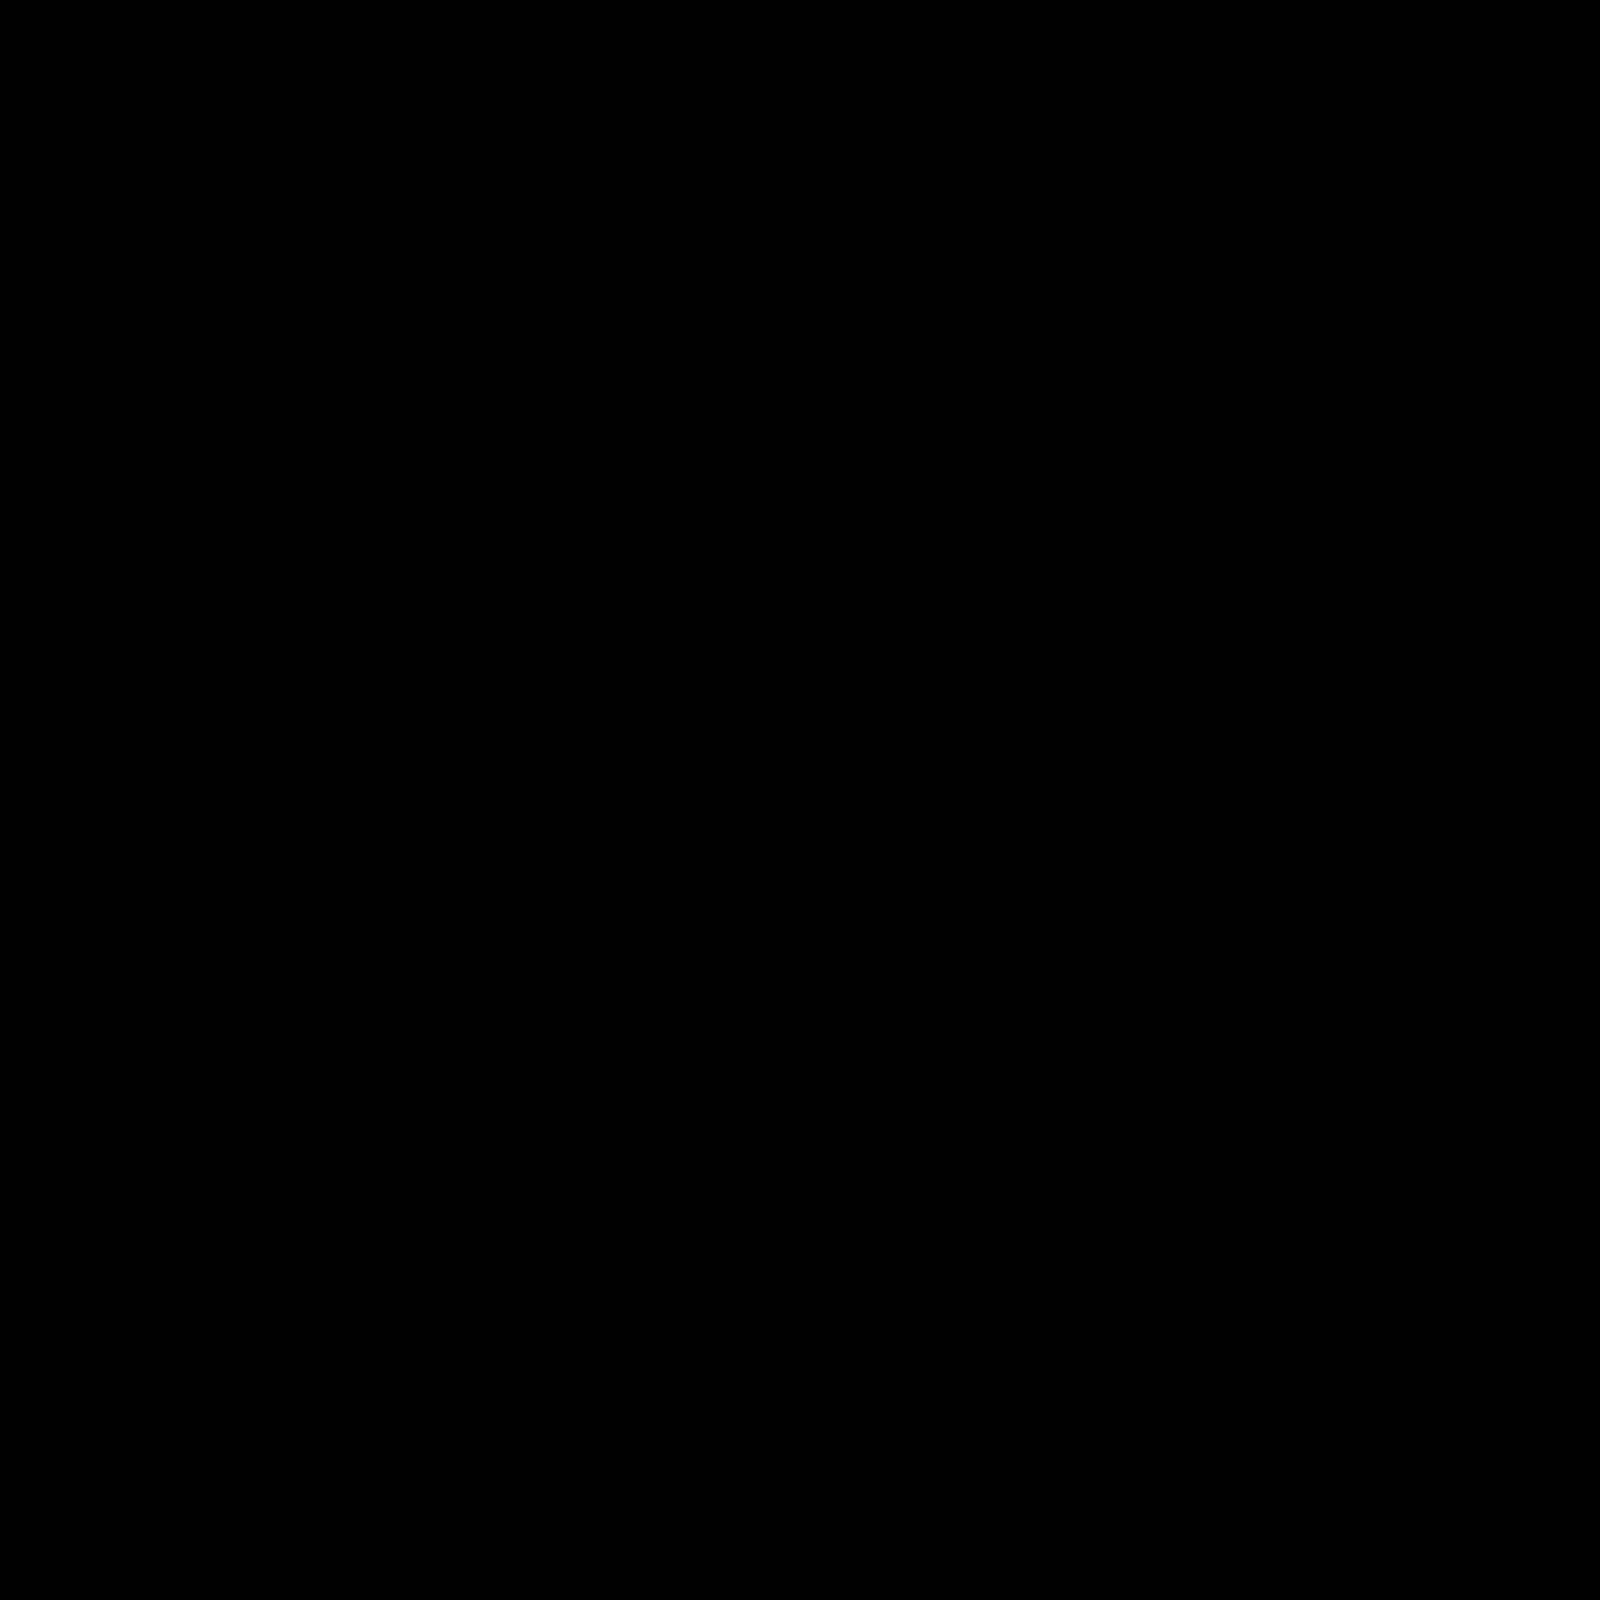 Кашляющий icon